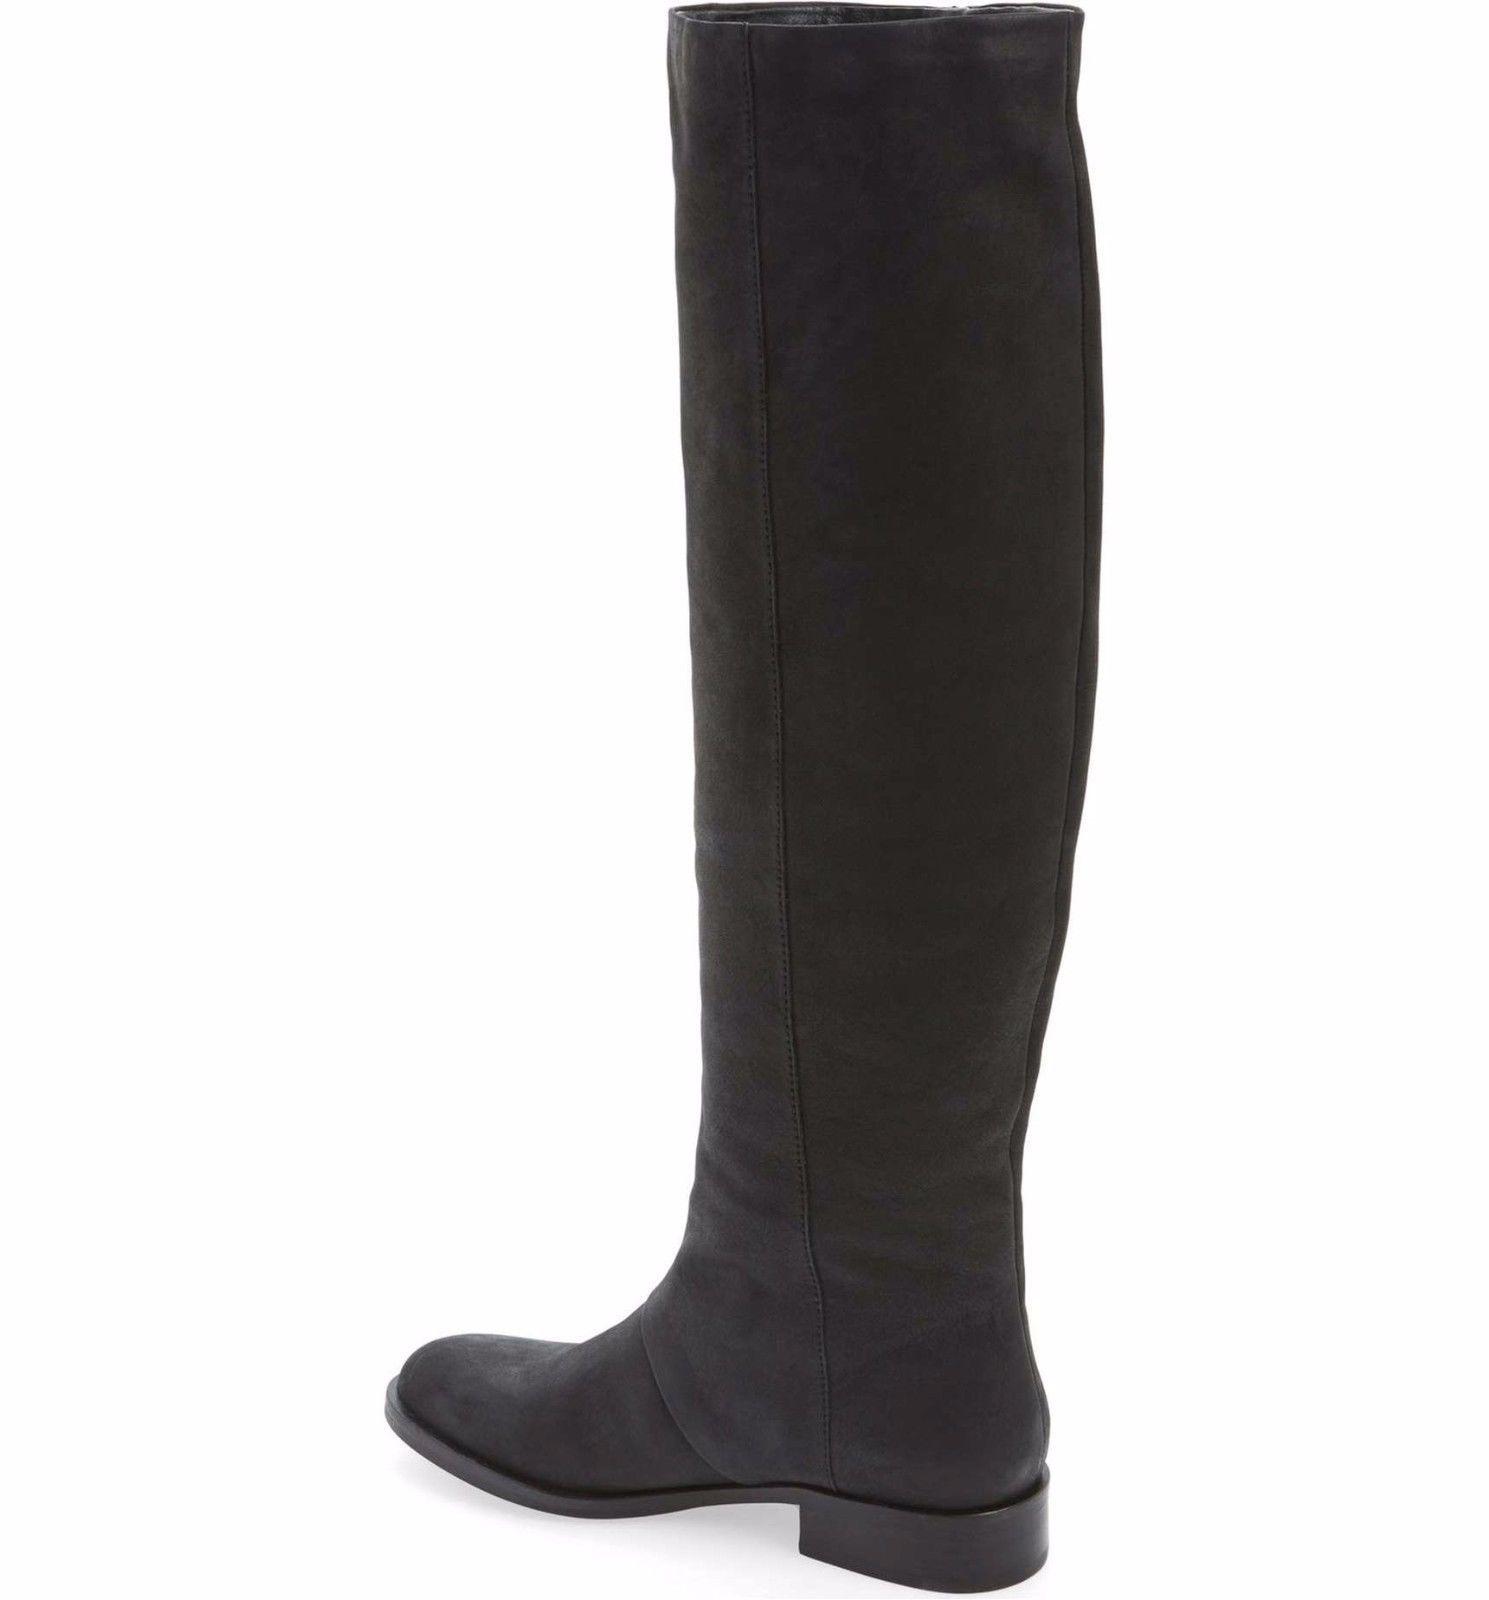 aa8ca56ef6e32  275 SAM EDELMAN New Josephine Tall Fringe Leather Riding Boots Black Size 5